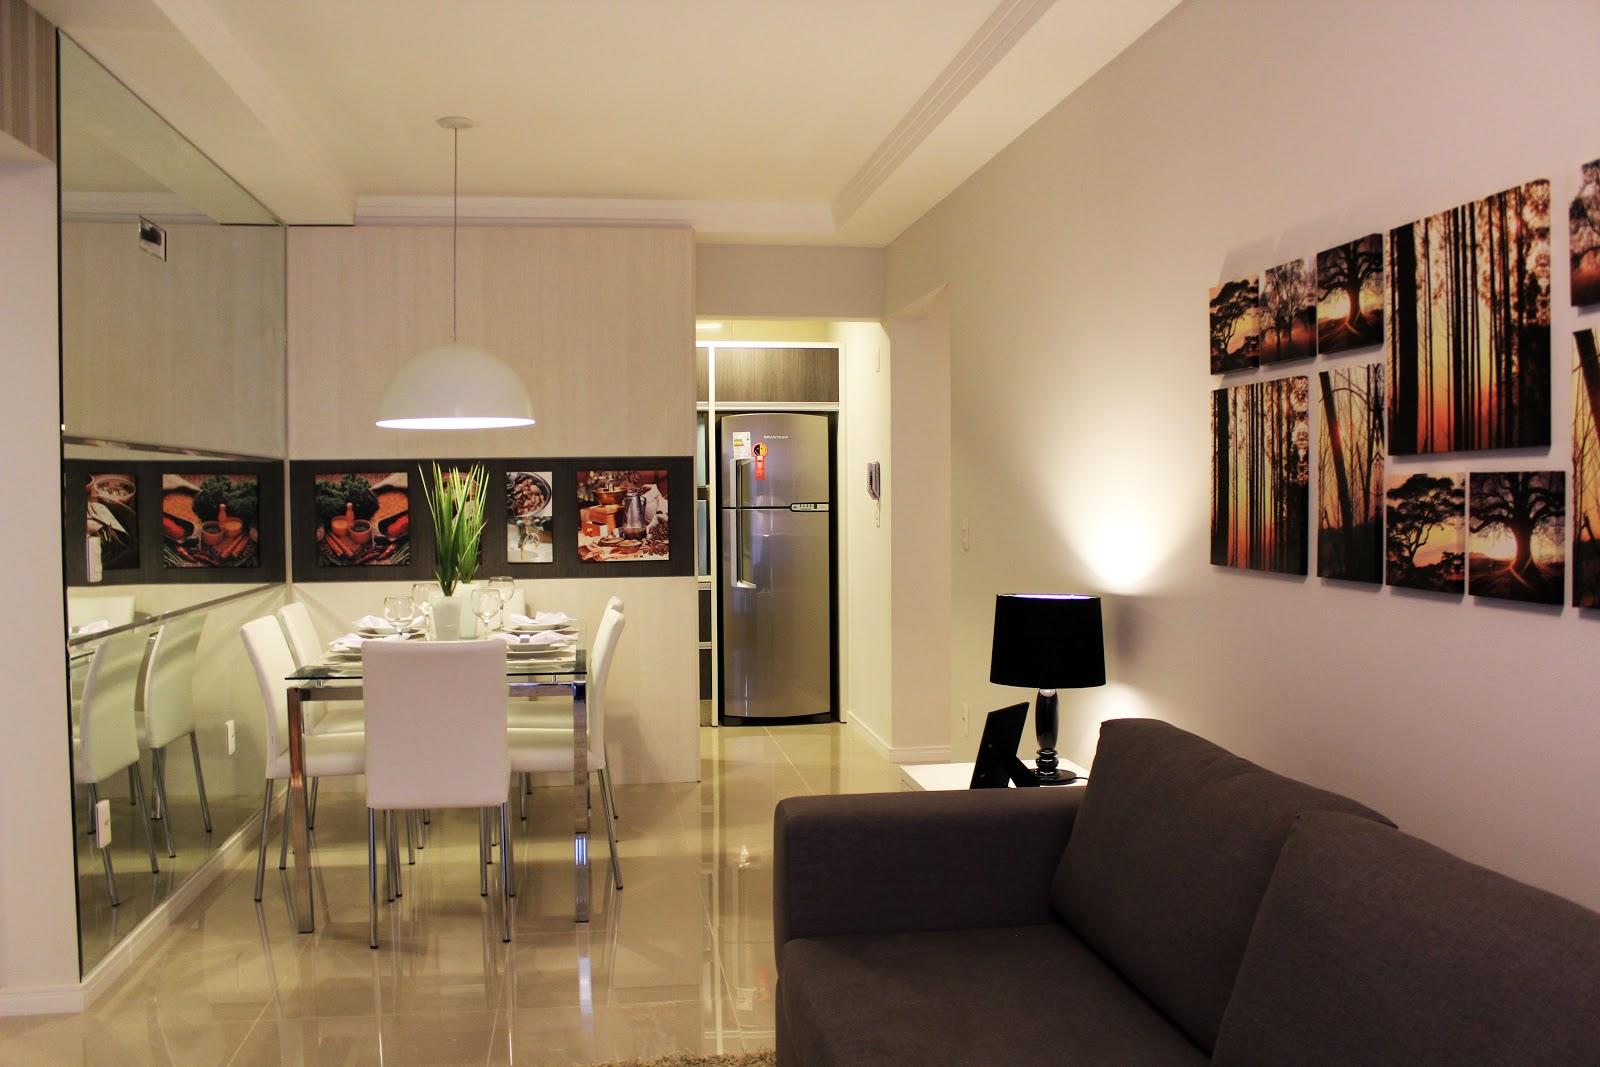 21 modelos de salas de jantar decoradas for Modelos salas para departamentos pequenos